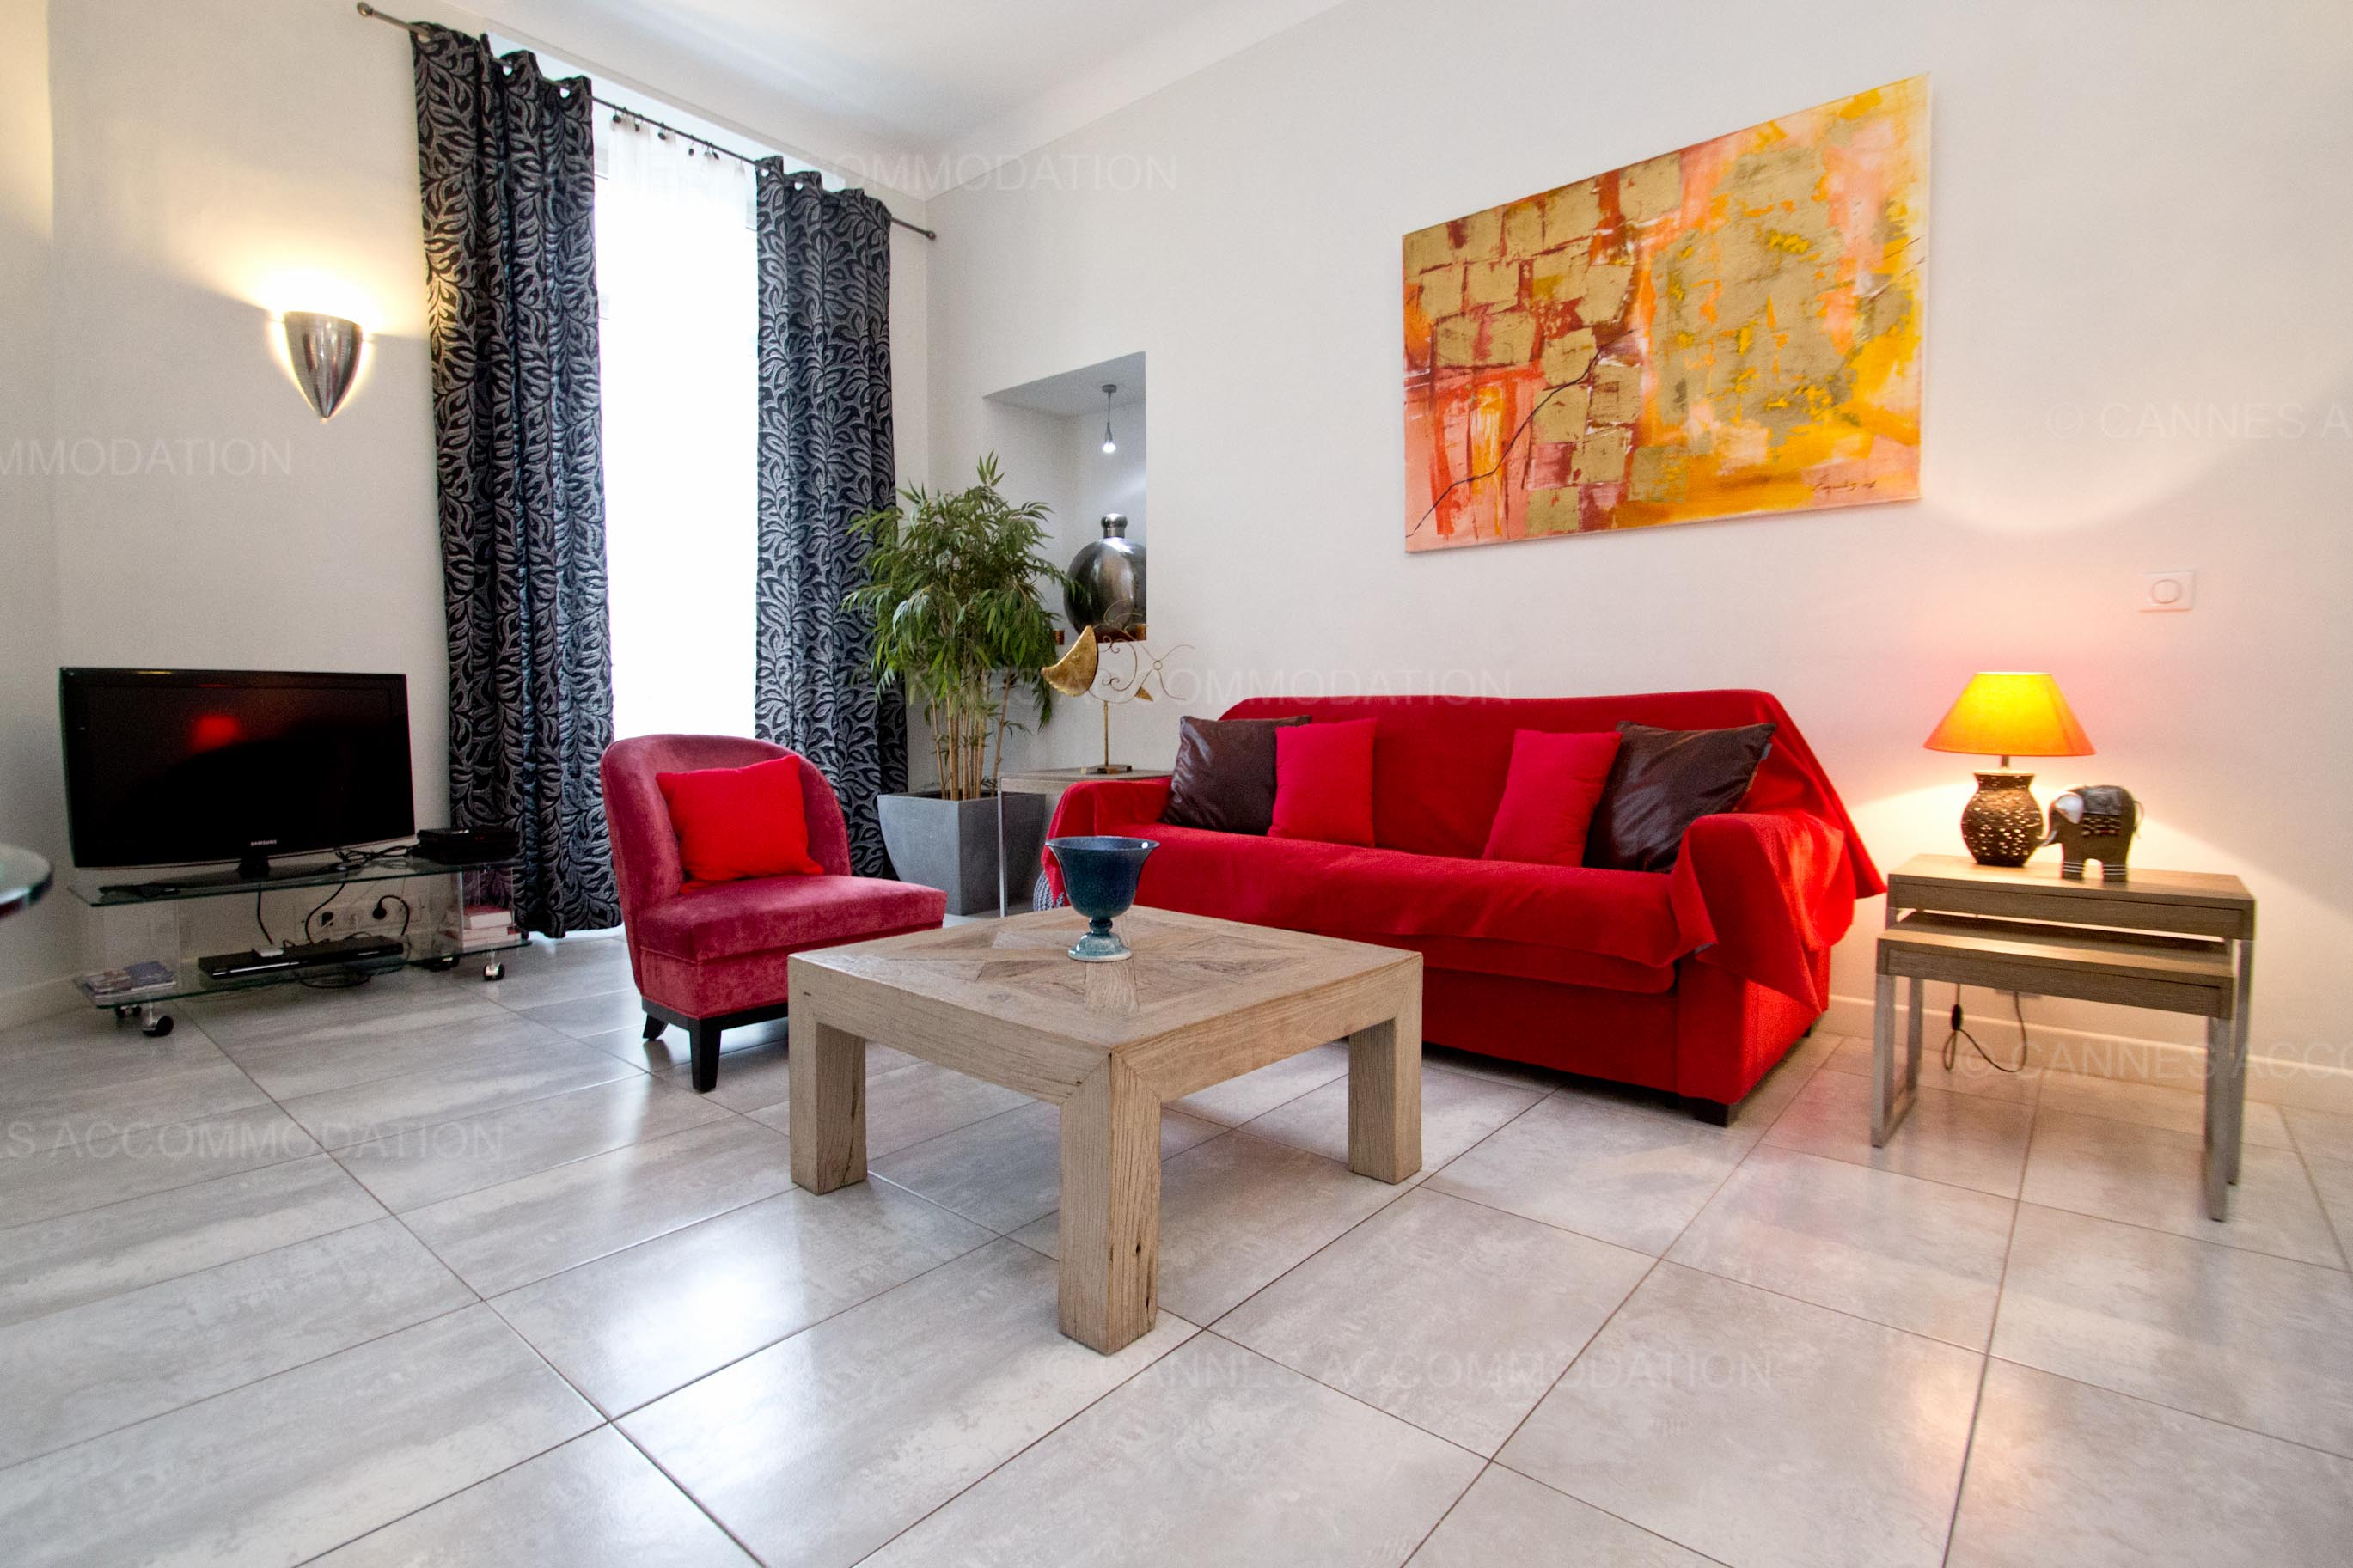 Appartement 1 chambre louer cannes secteur carlton martinez colombe cannes accommodation - Prix chambre carlton cannes ...